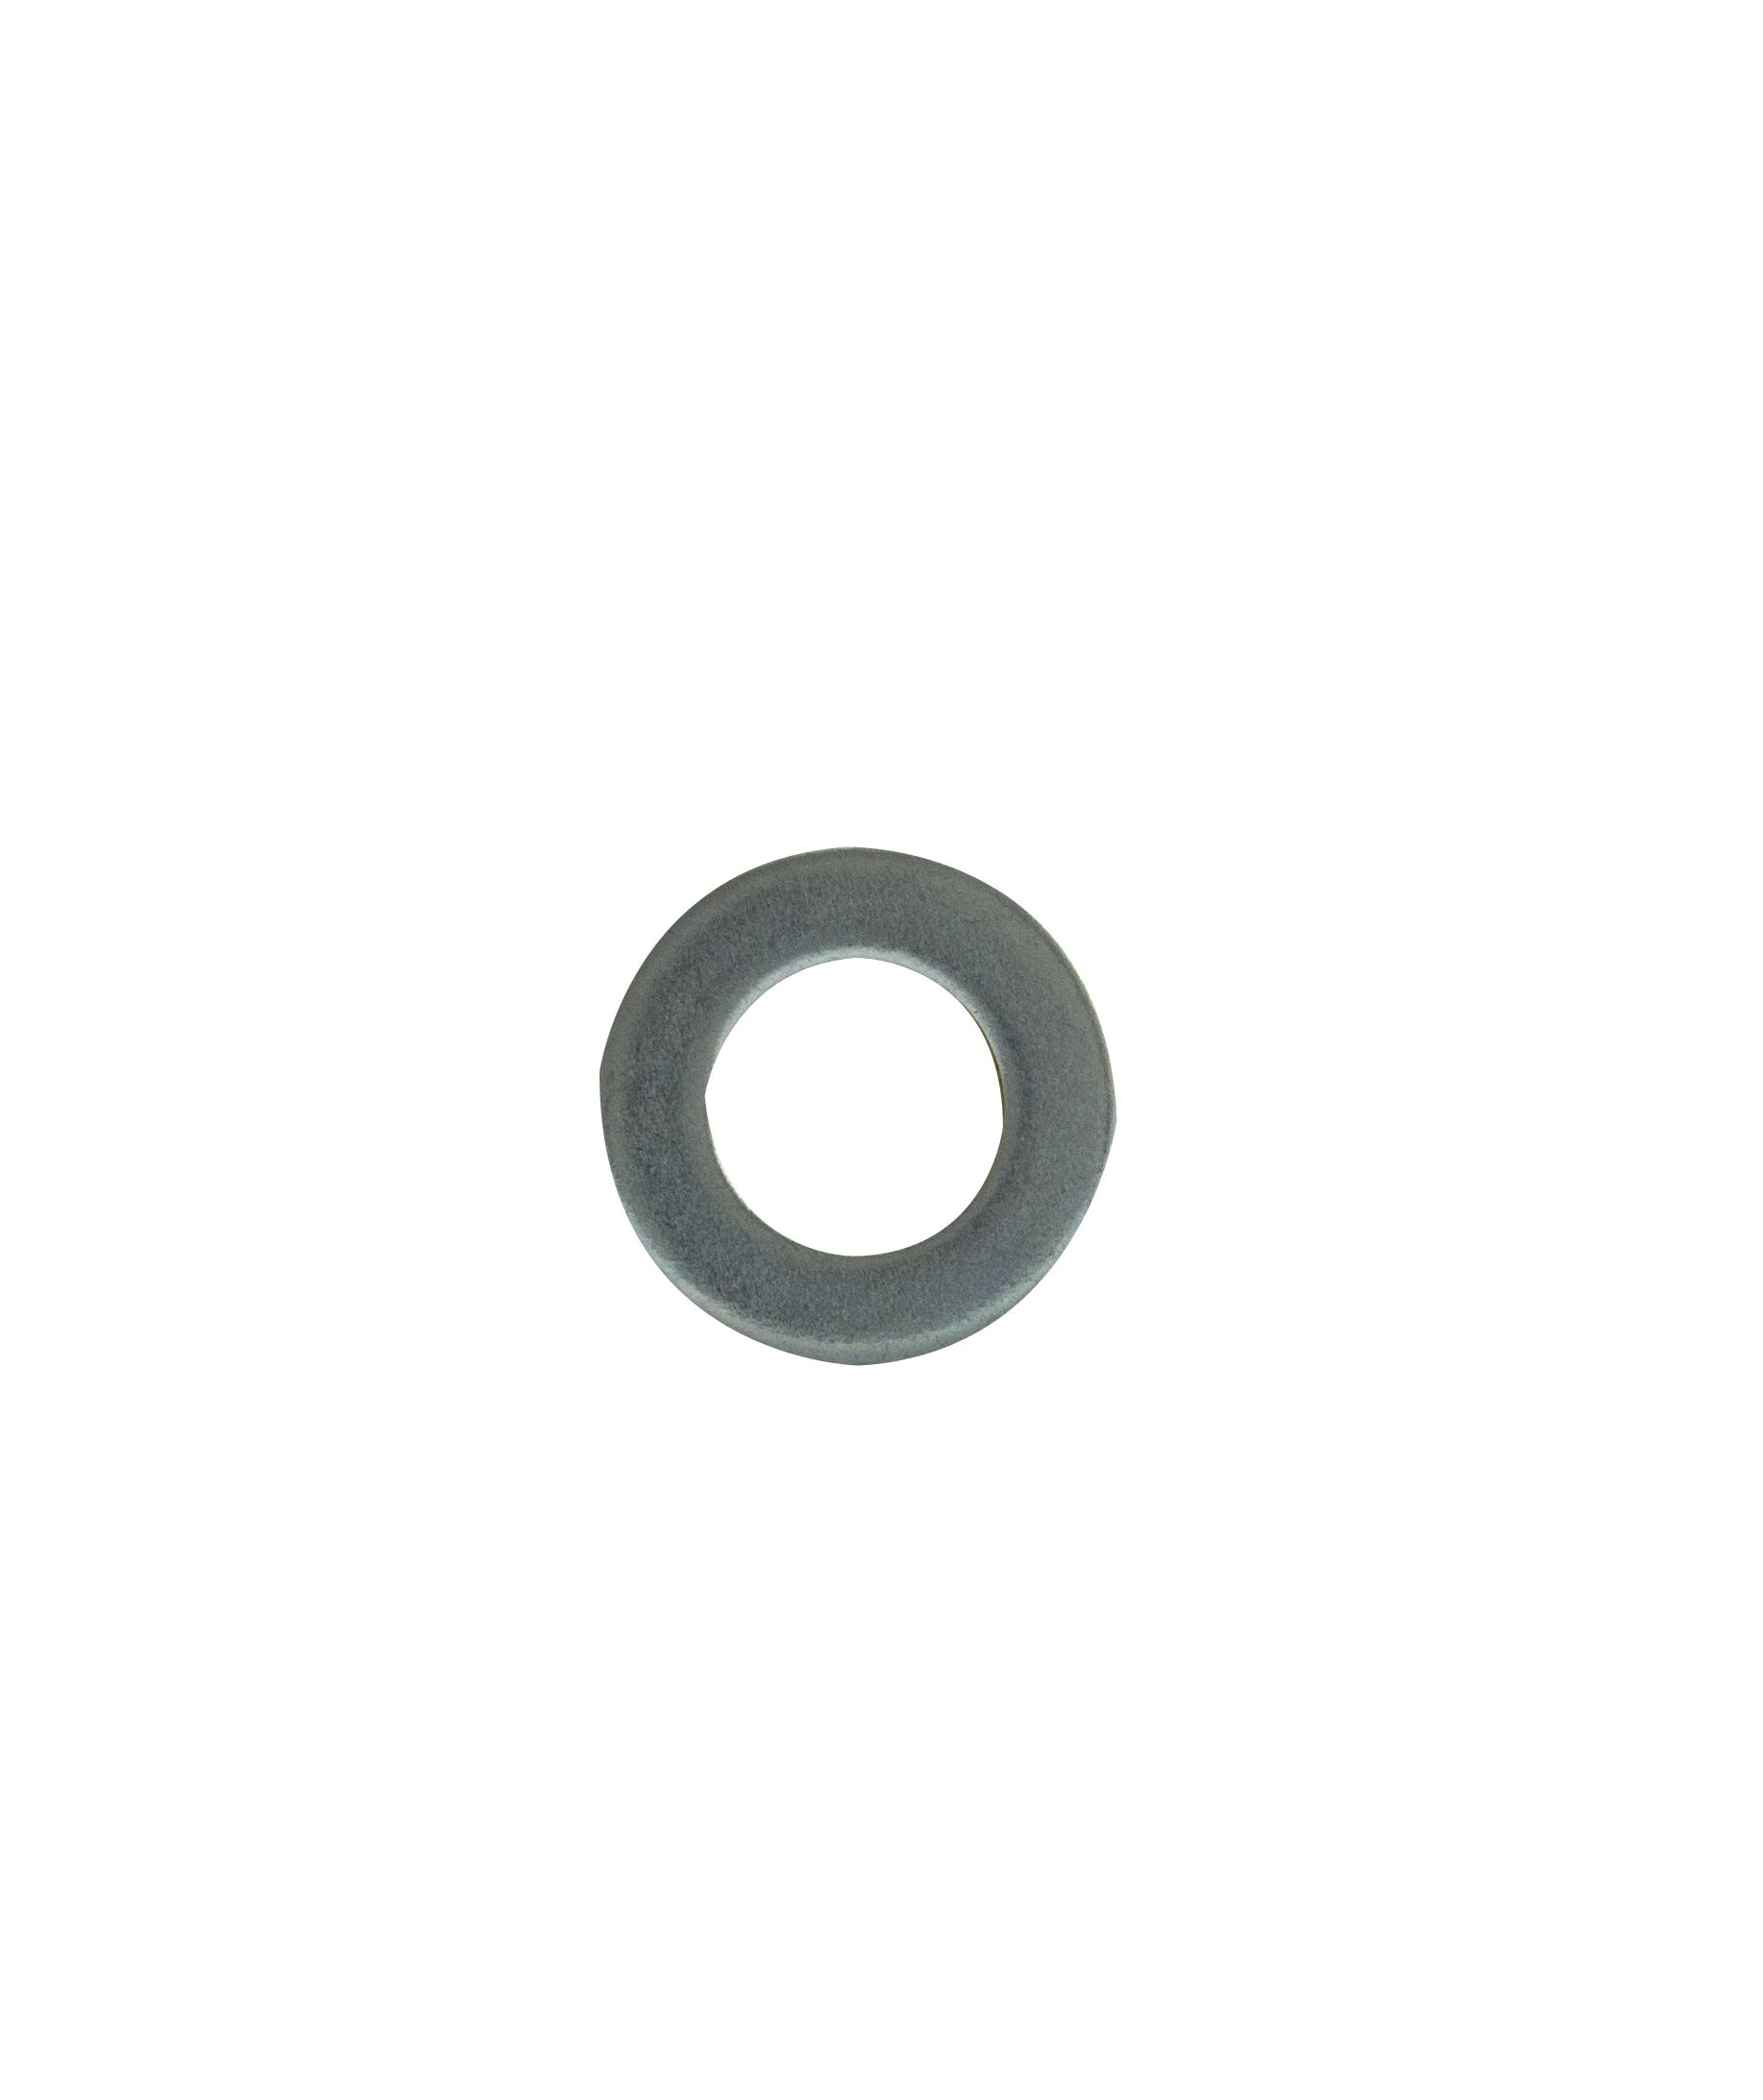 M8 Metric Flat Washer DIN 125A BZP ***